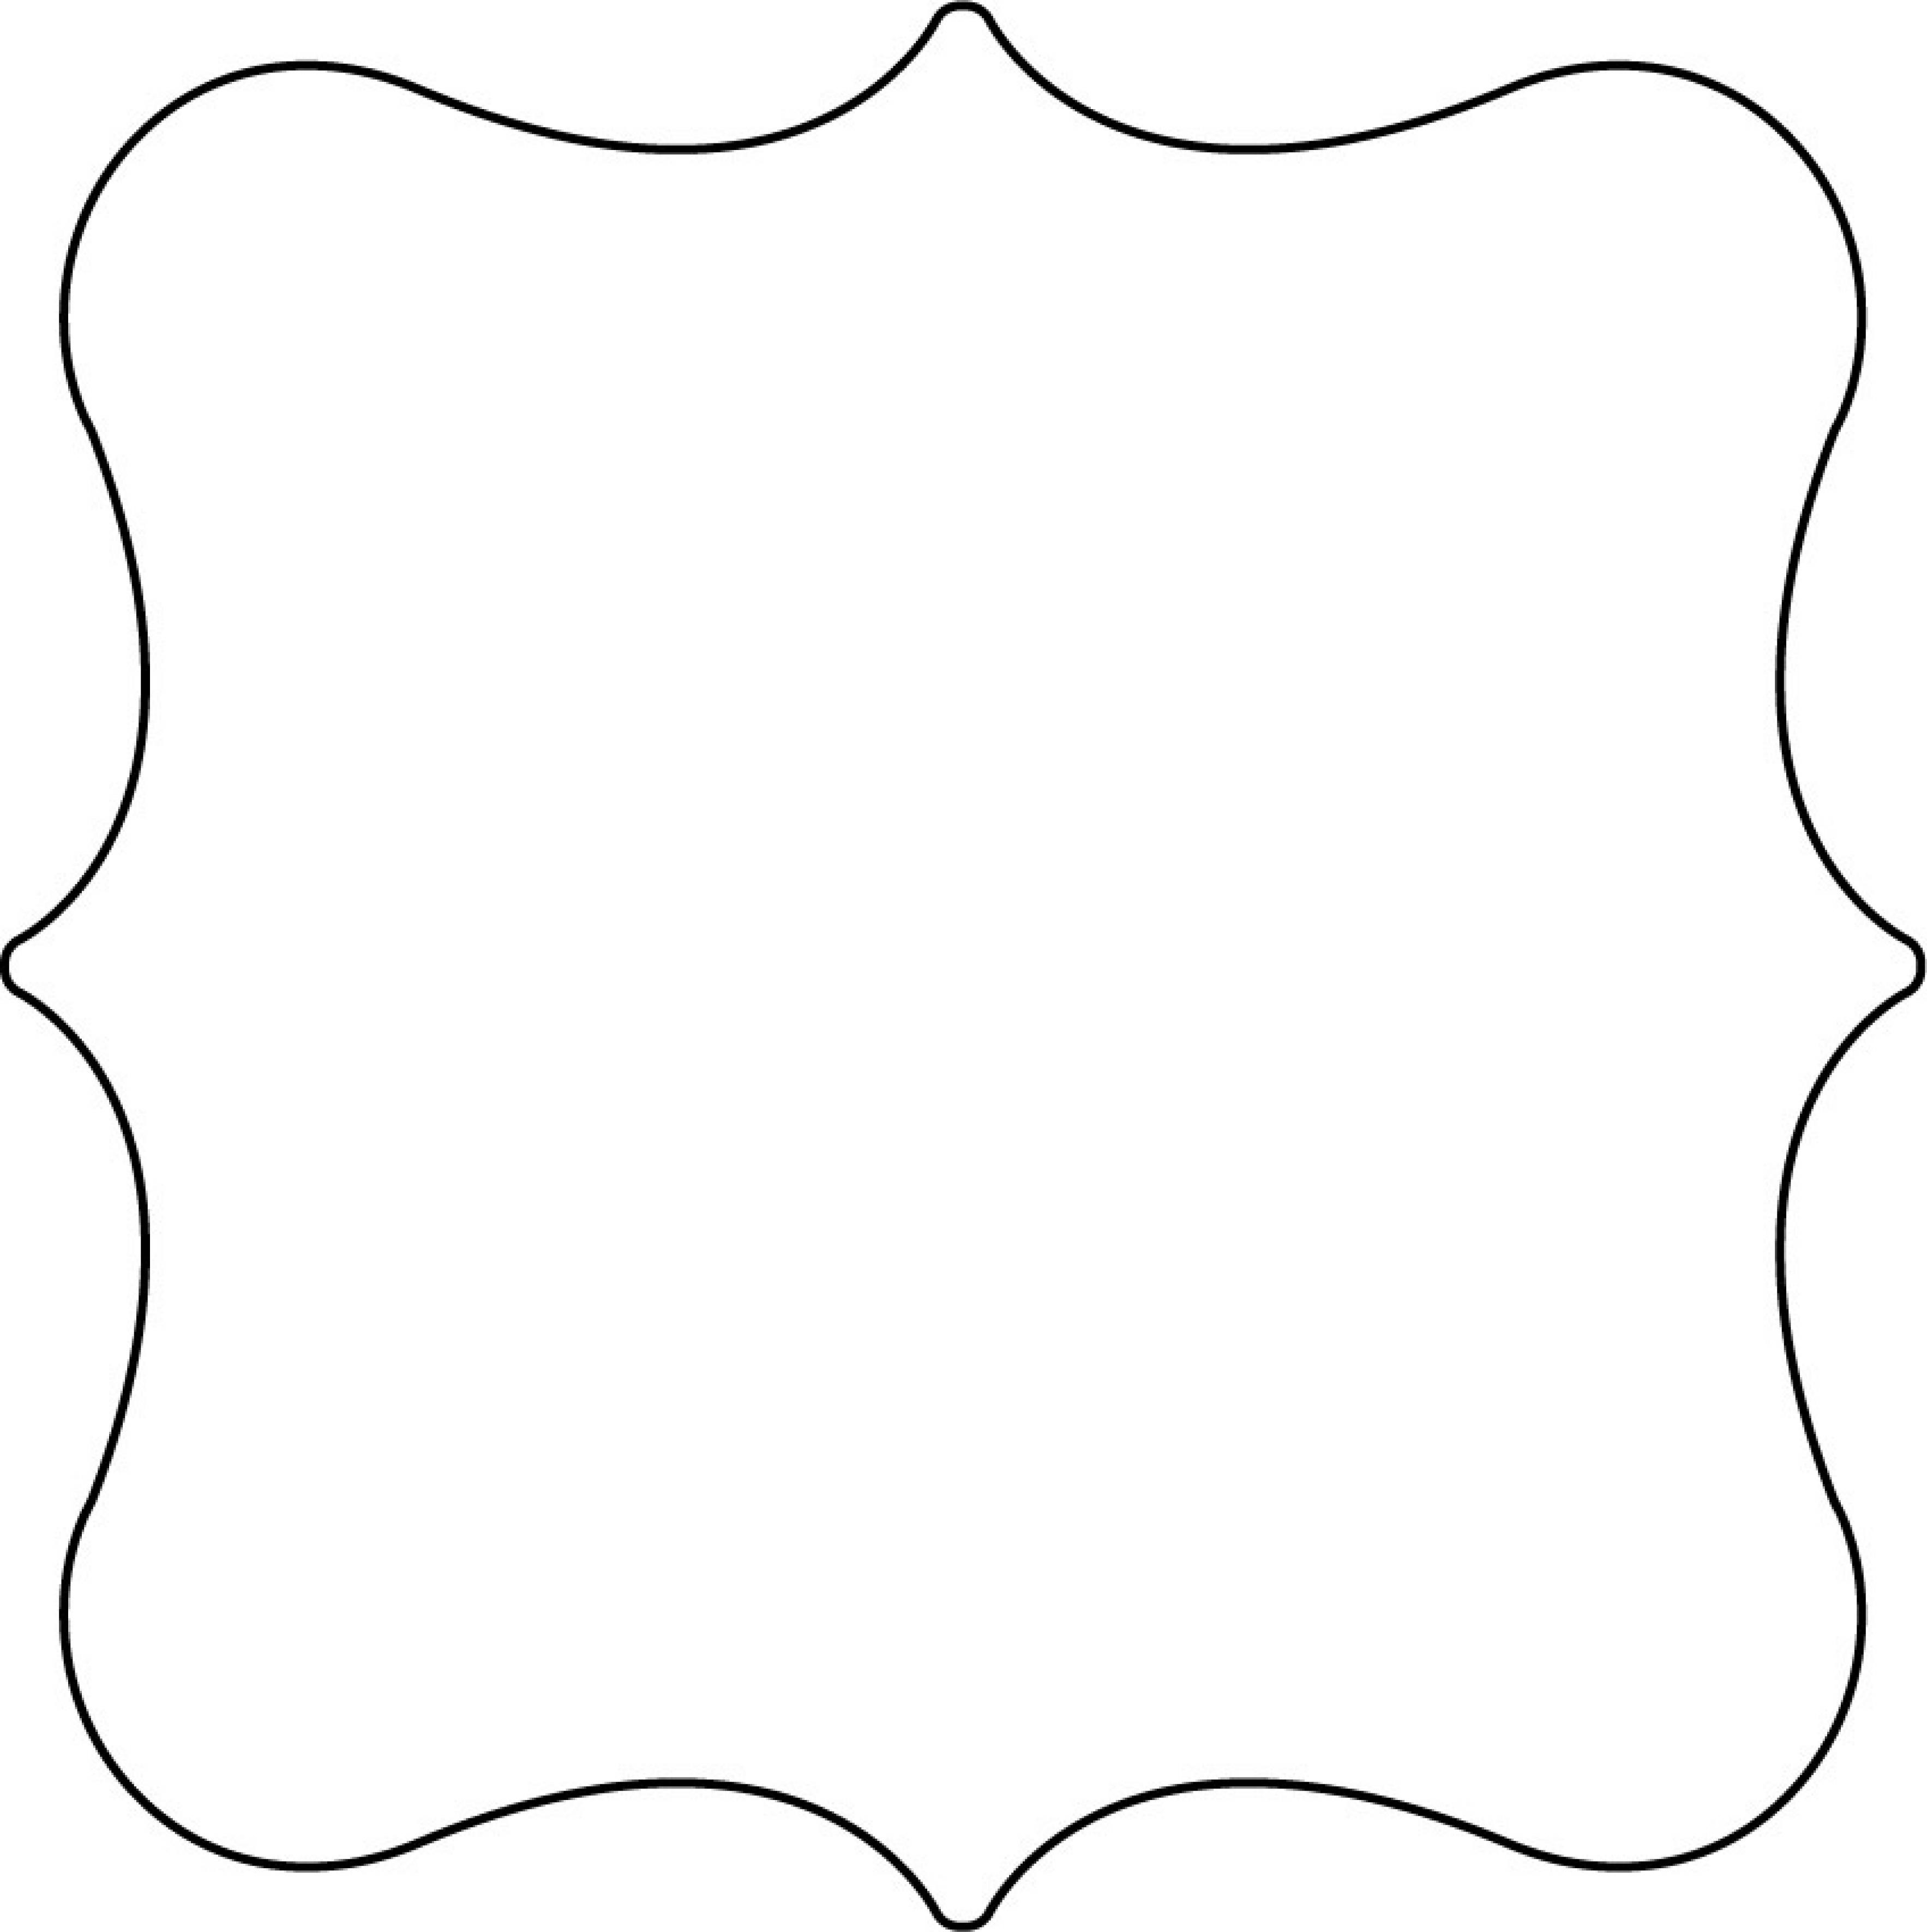 Bracket shape clip art. Label clipart label outline